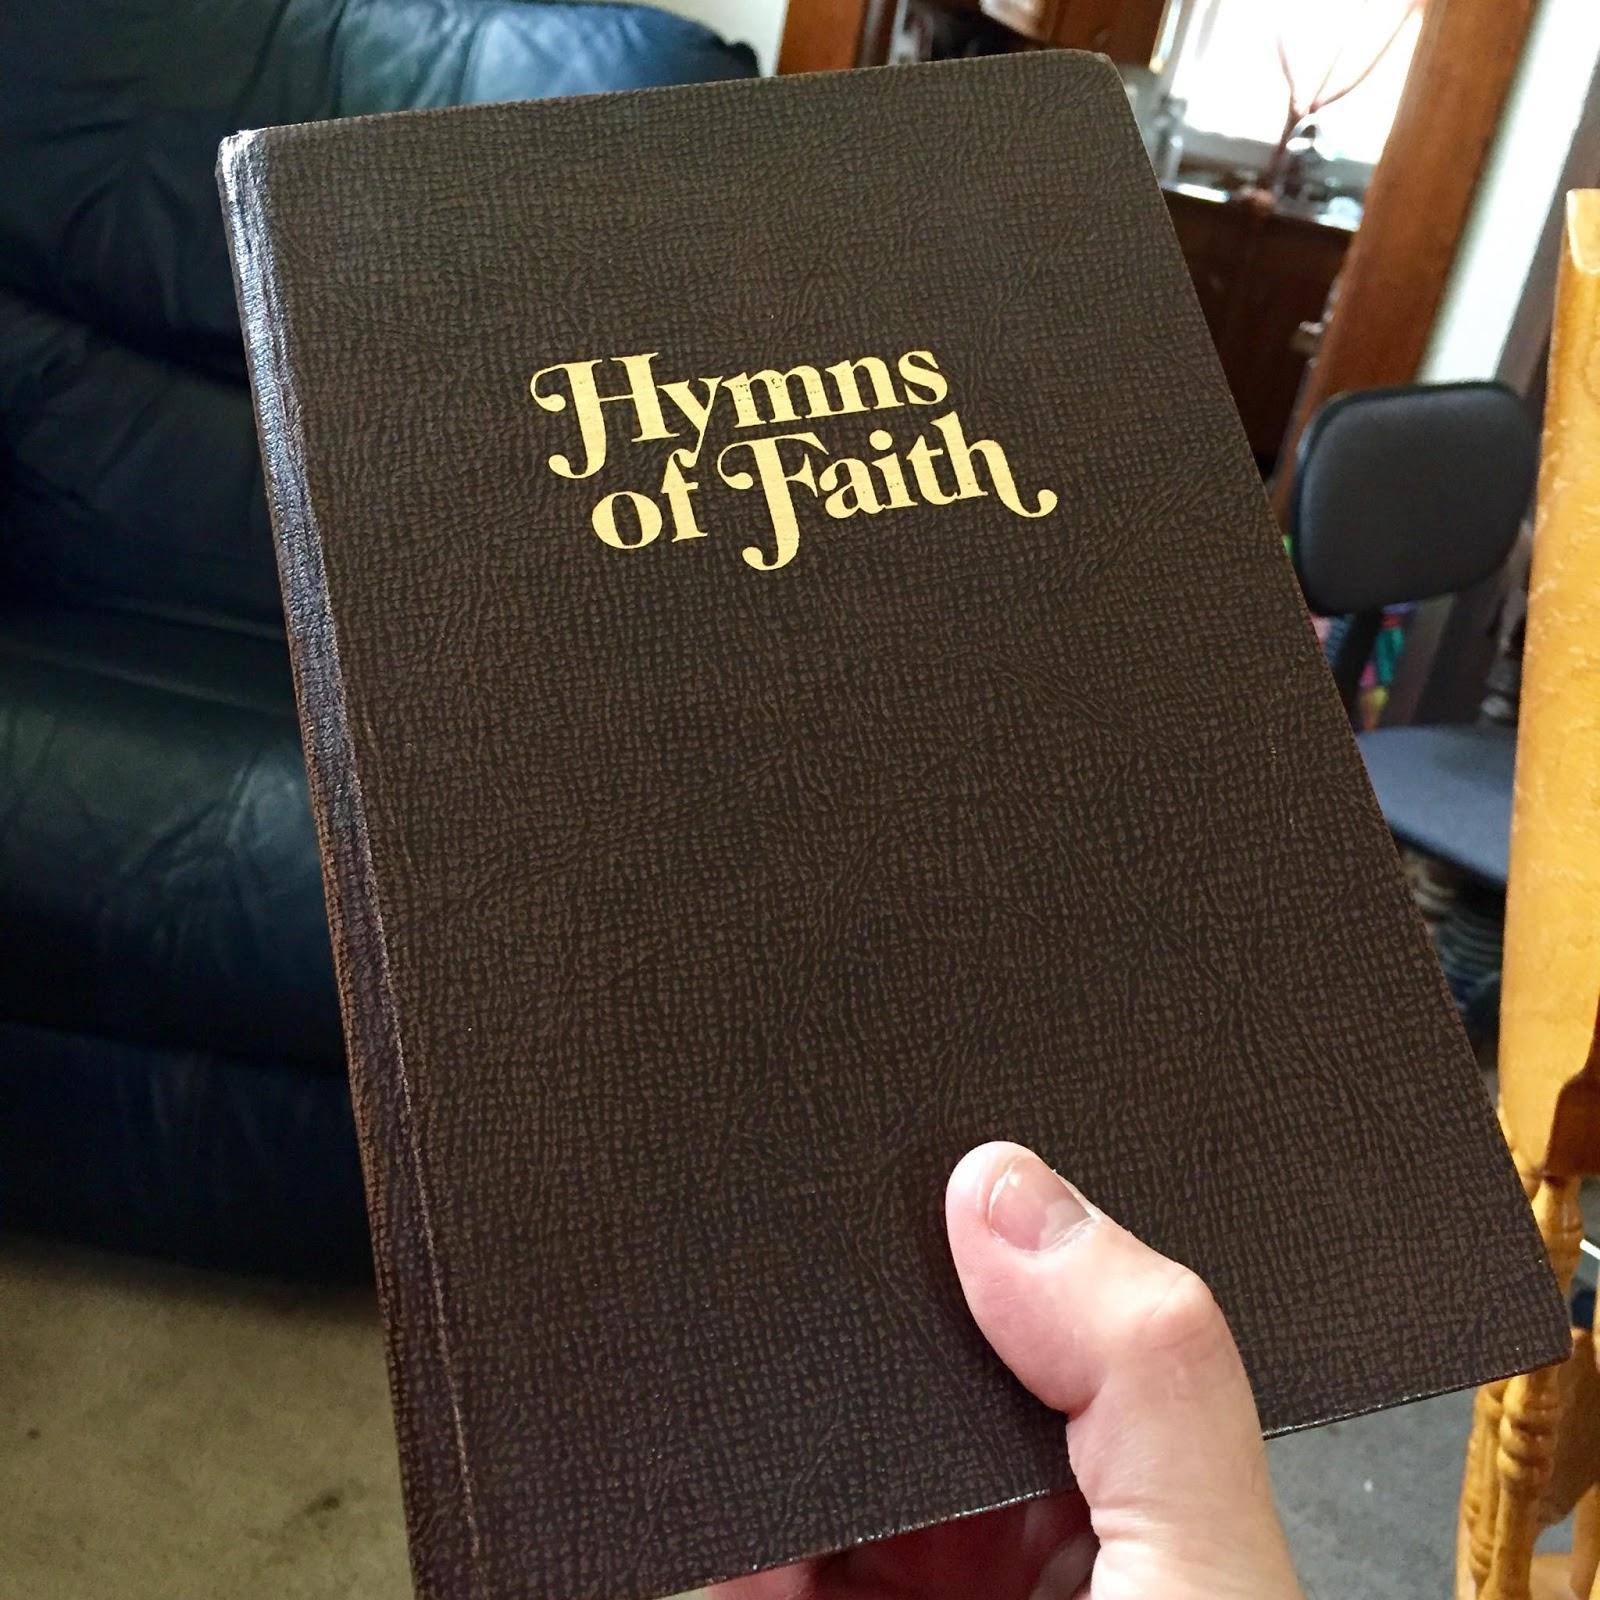 For All You Hymn Lovers - God Geek | Robert Wimer